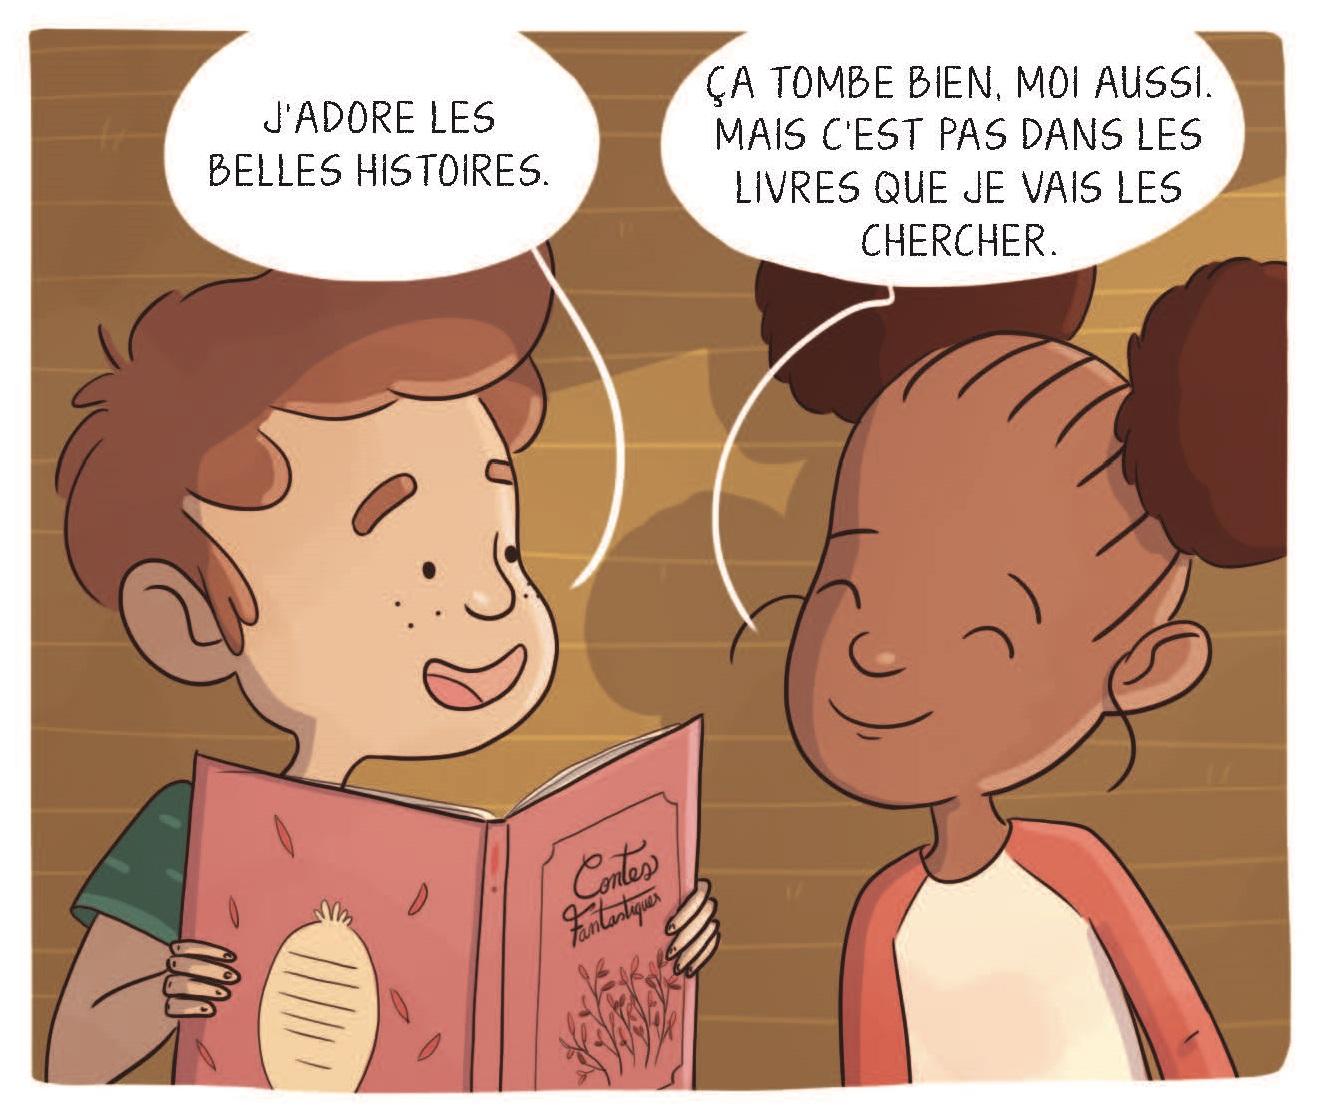 Blaise et Liloye